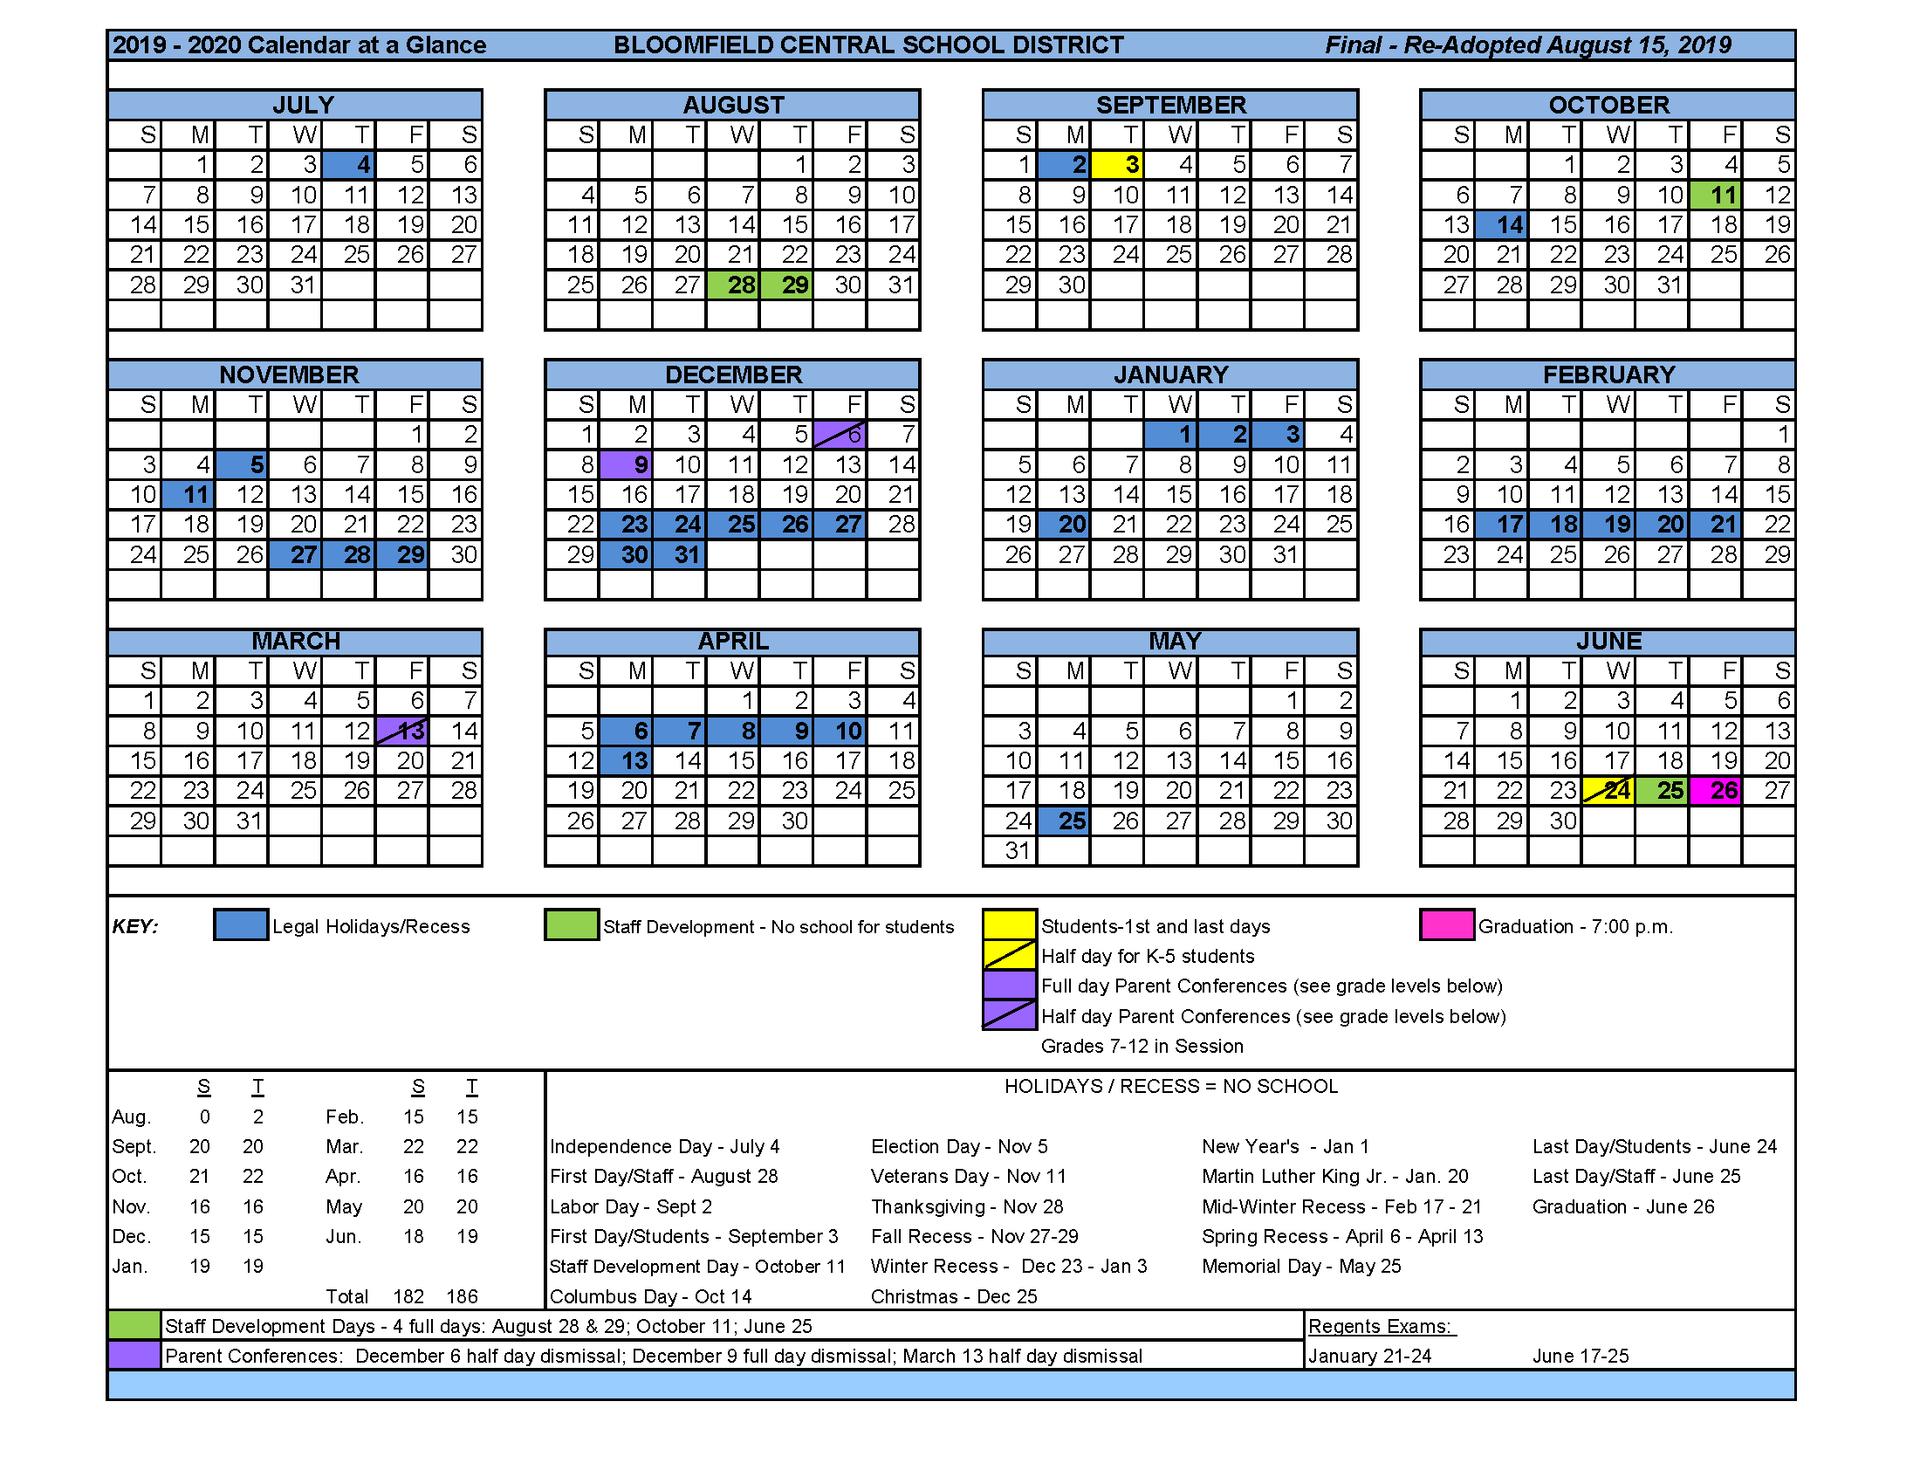 image of the calendar pdf